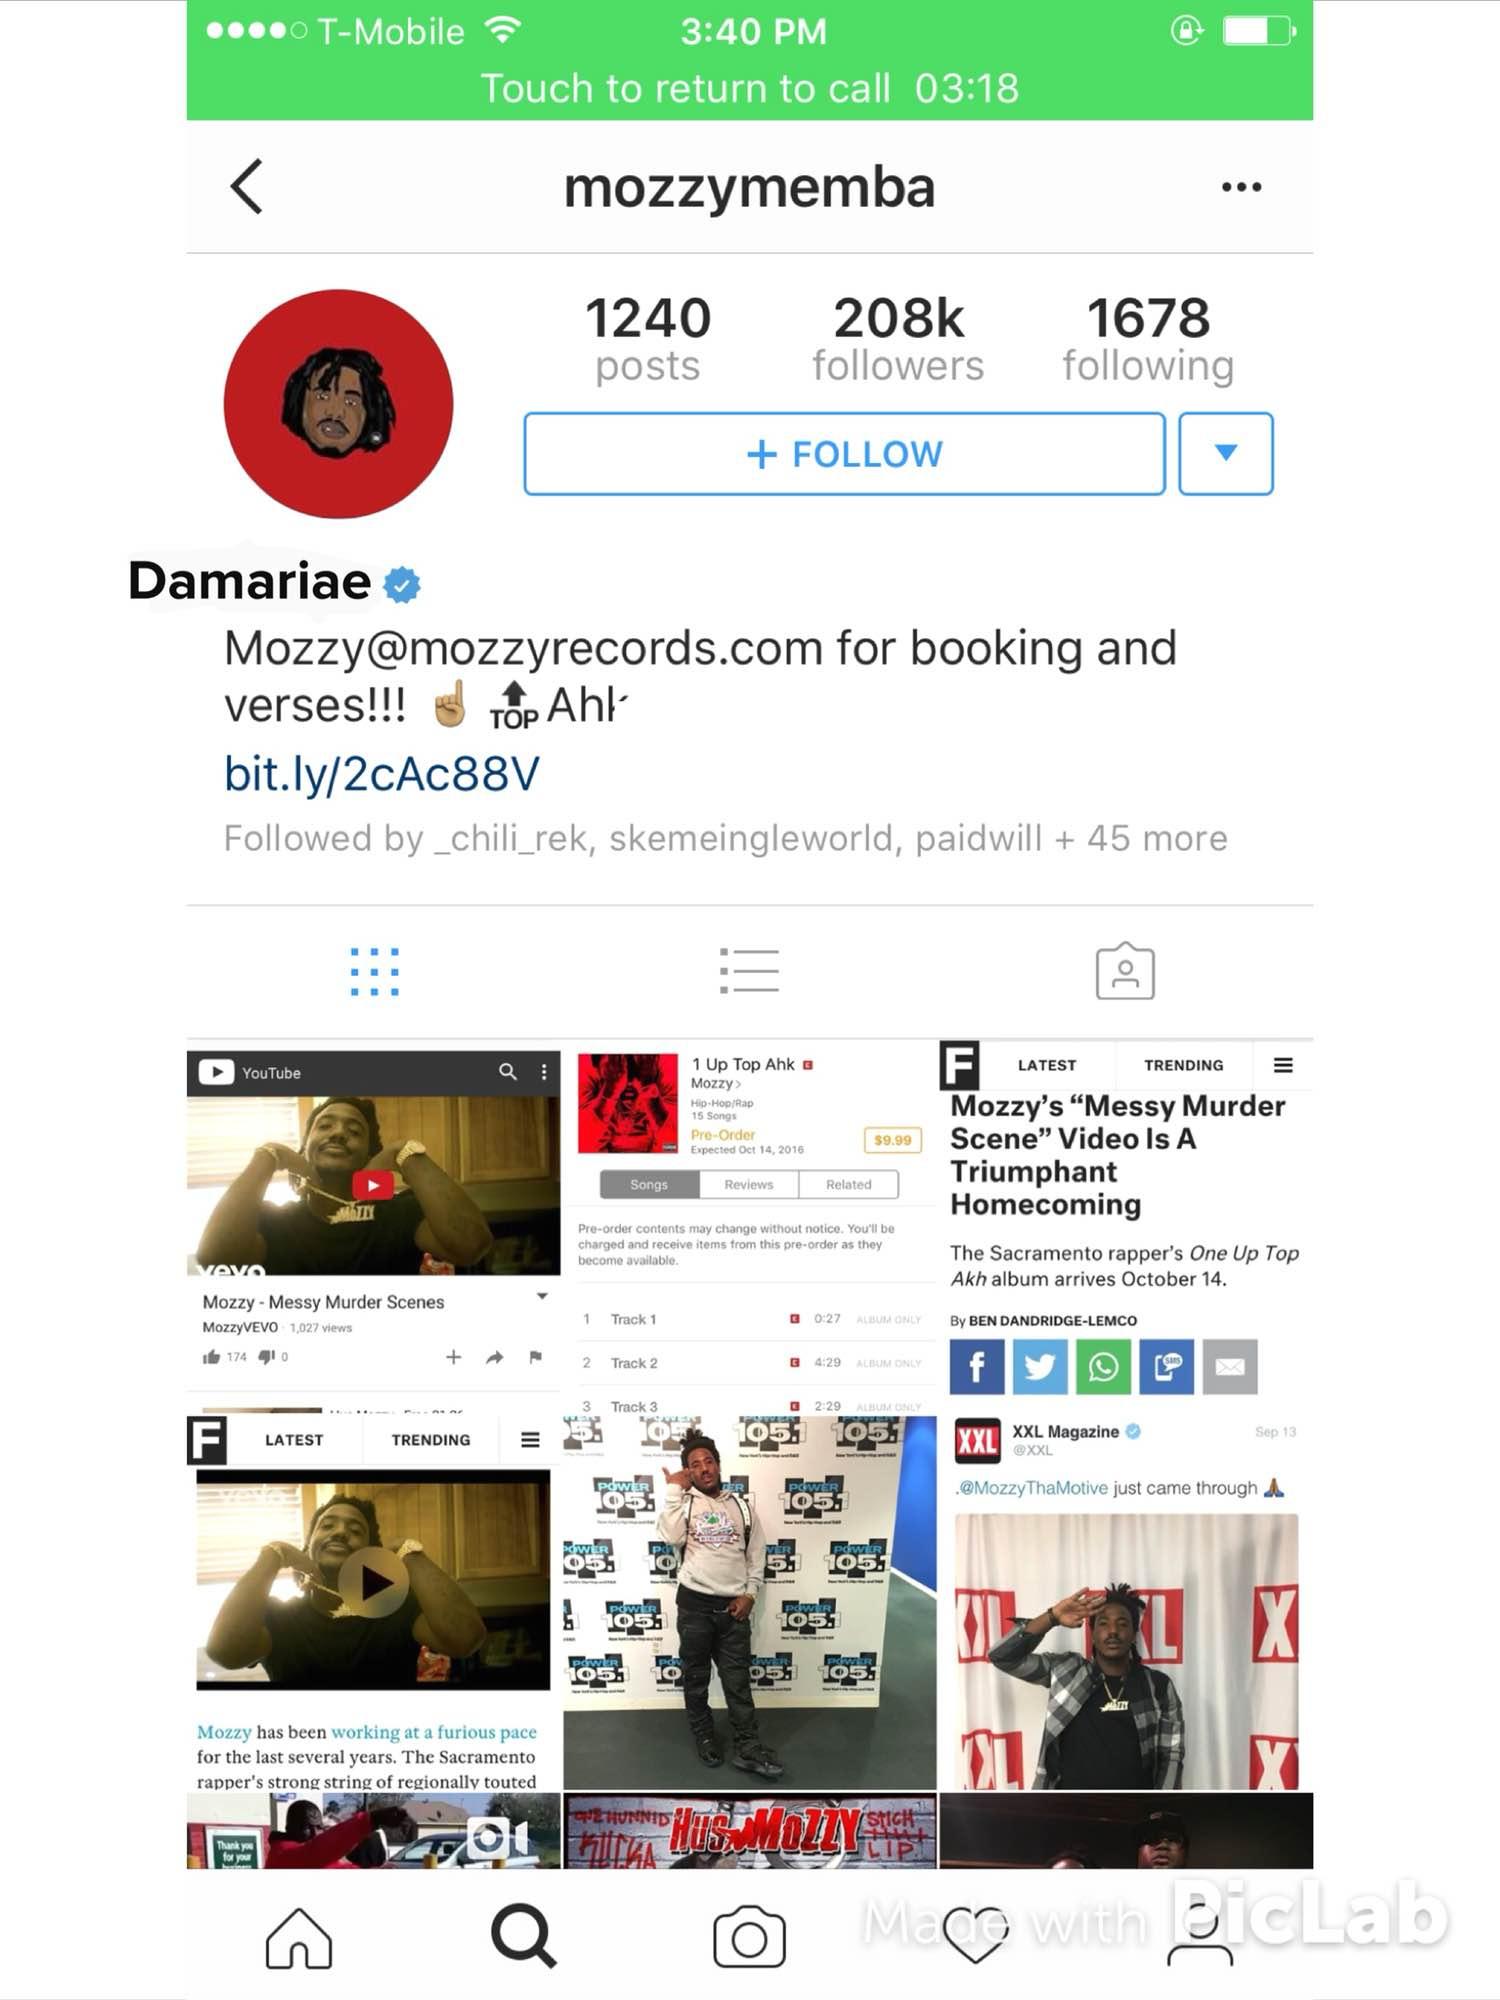 http://instagram.com/mozzymemba